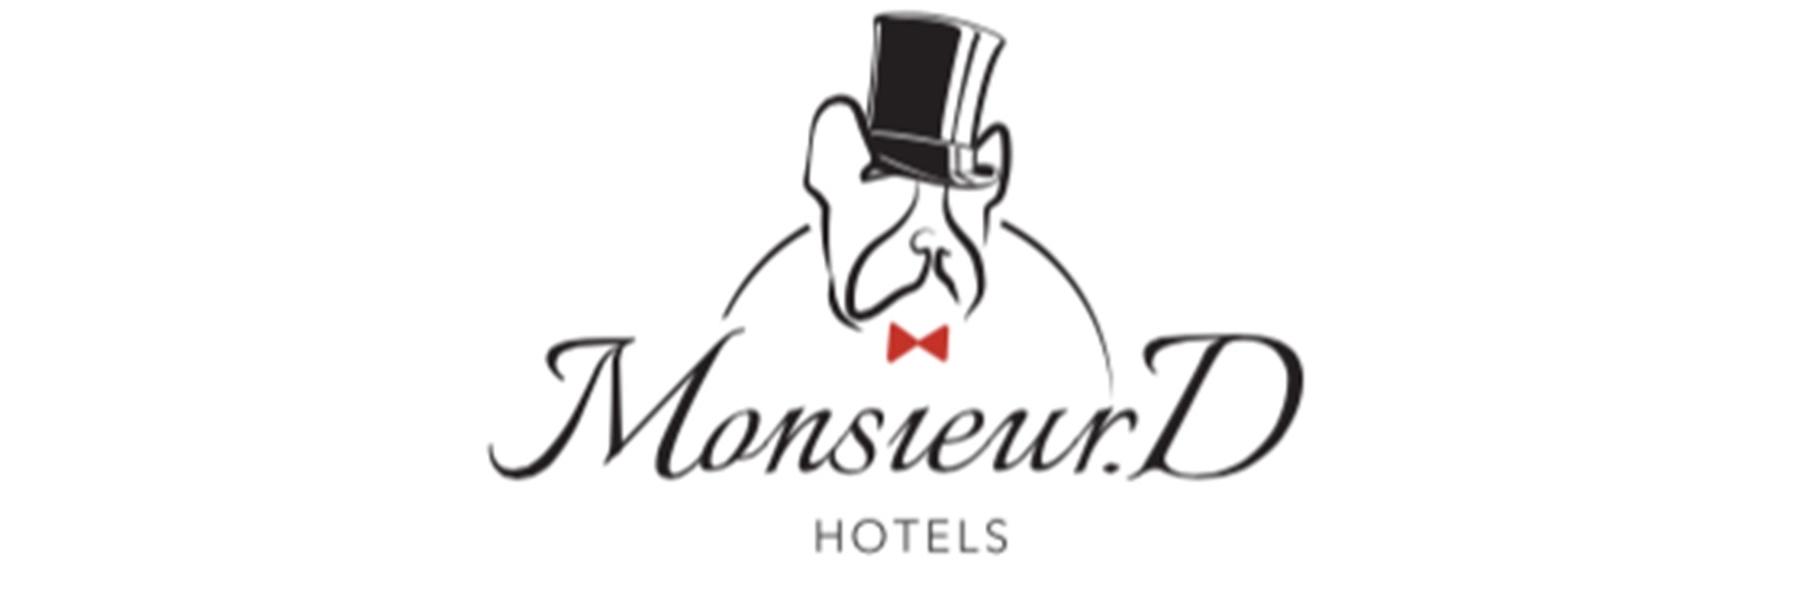 https://gody.vn/blog/lifeandgostudio4271/post/monsieur-diesel-hotel-khach-san-chat-gia-mem-khi-di-du-lich-da-nang-5604